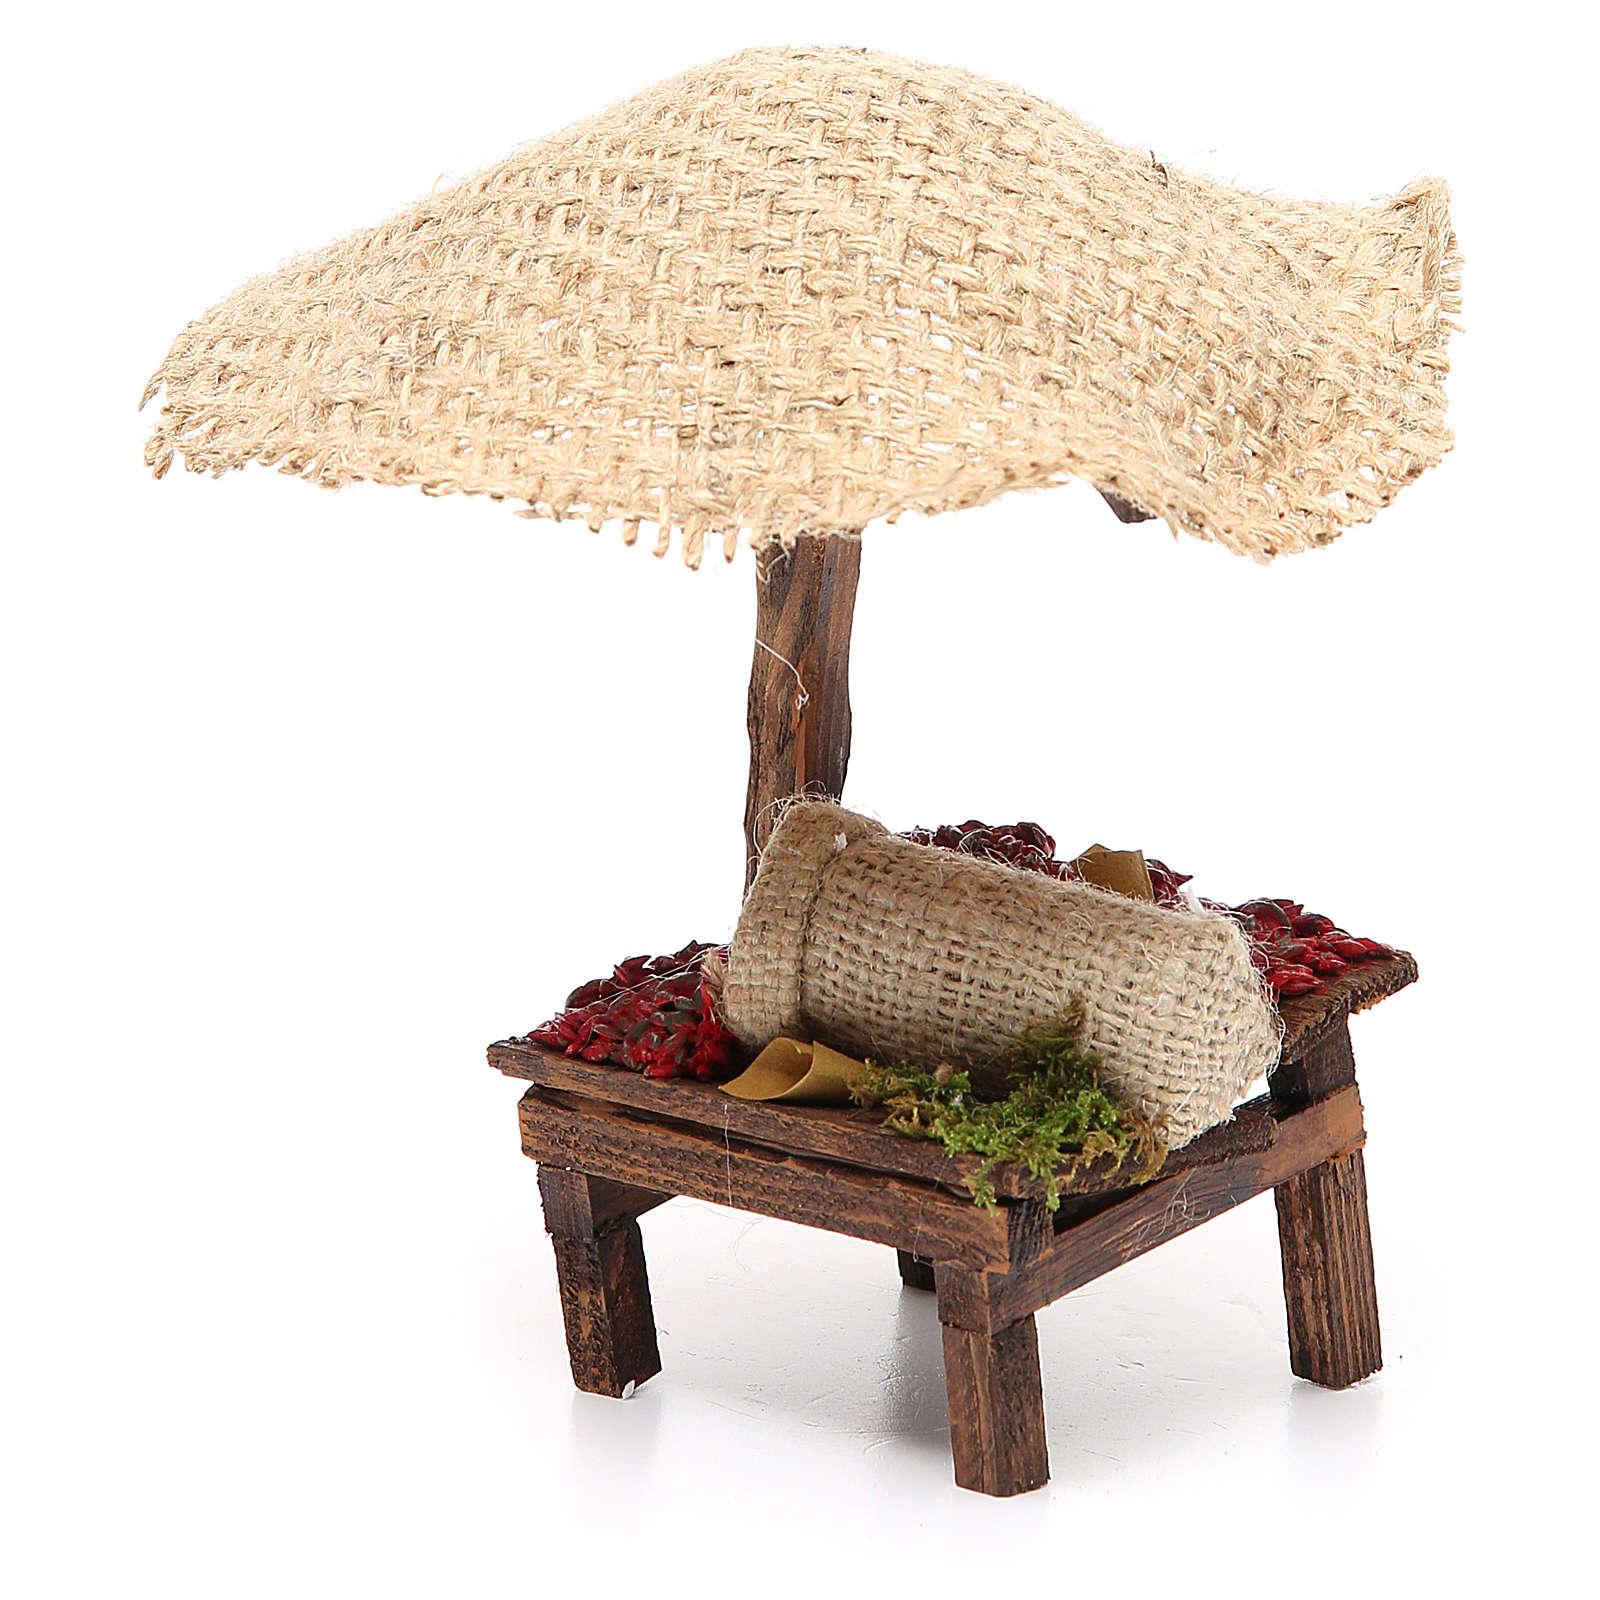 Workshop nativity with beach umbrella, chili peppers 16x10x12cm 4